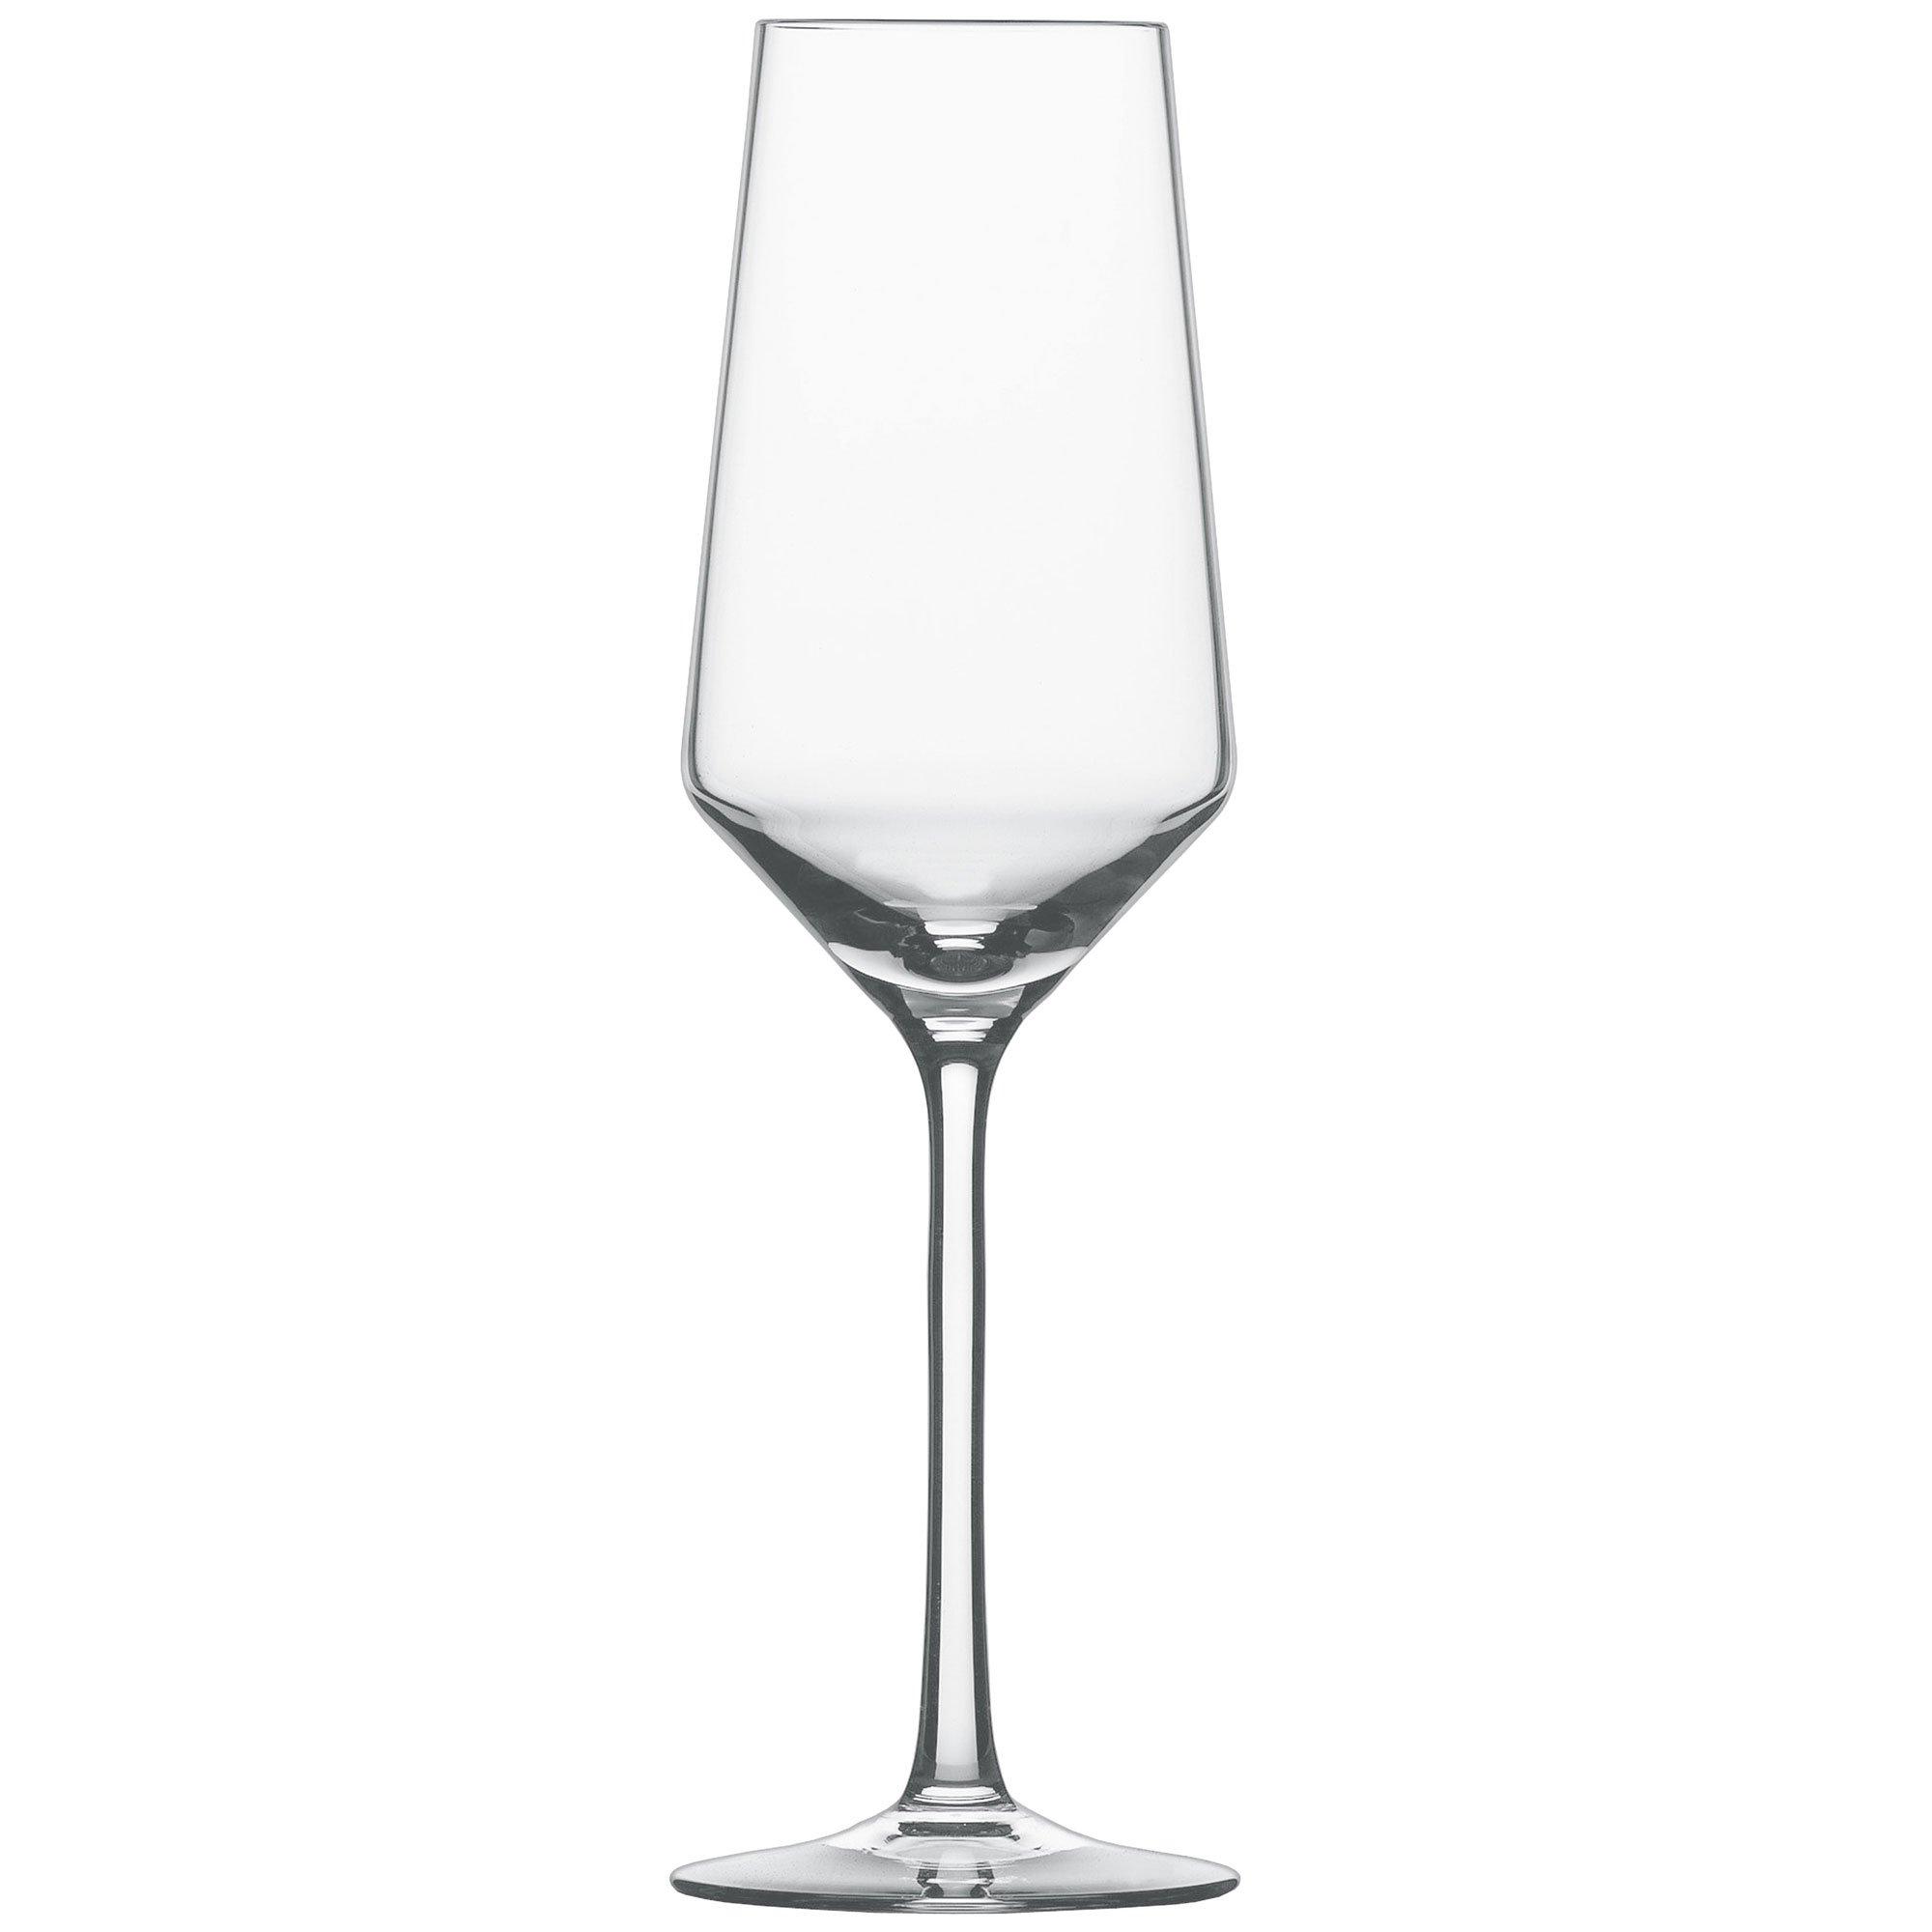 Shot Zwiesel PURE Pure champagne glass 297cc 30018 6 -legged set 0949529